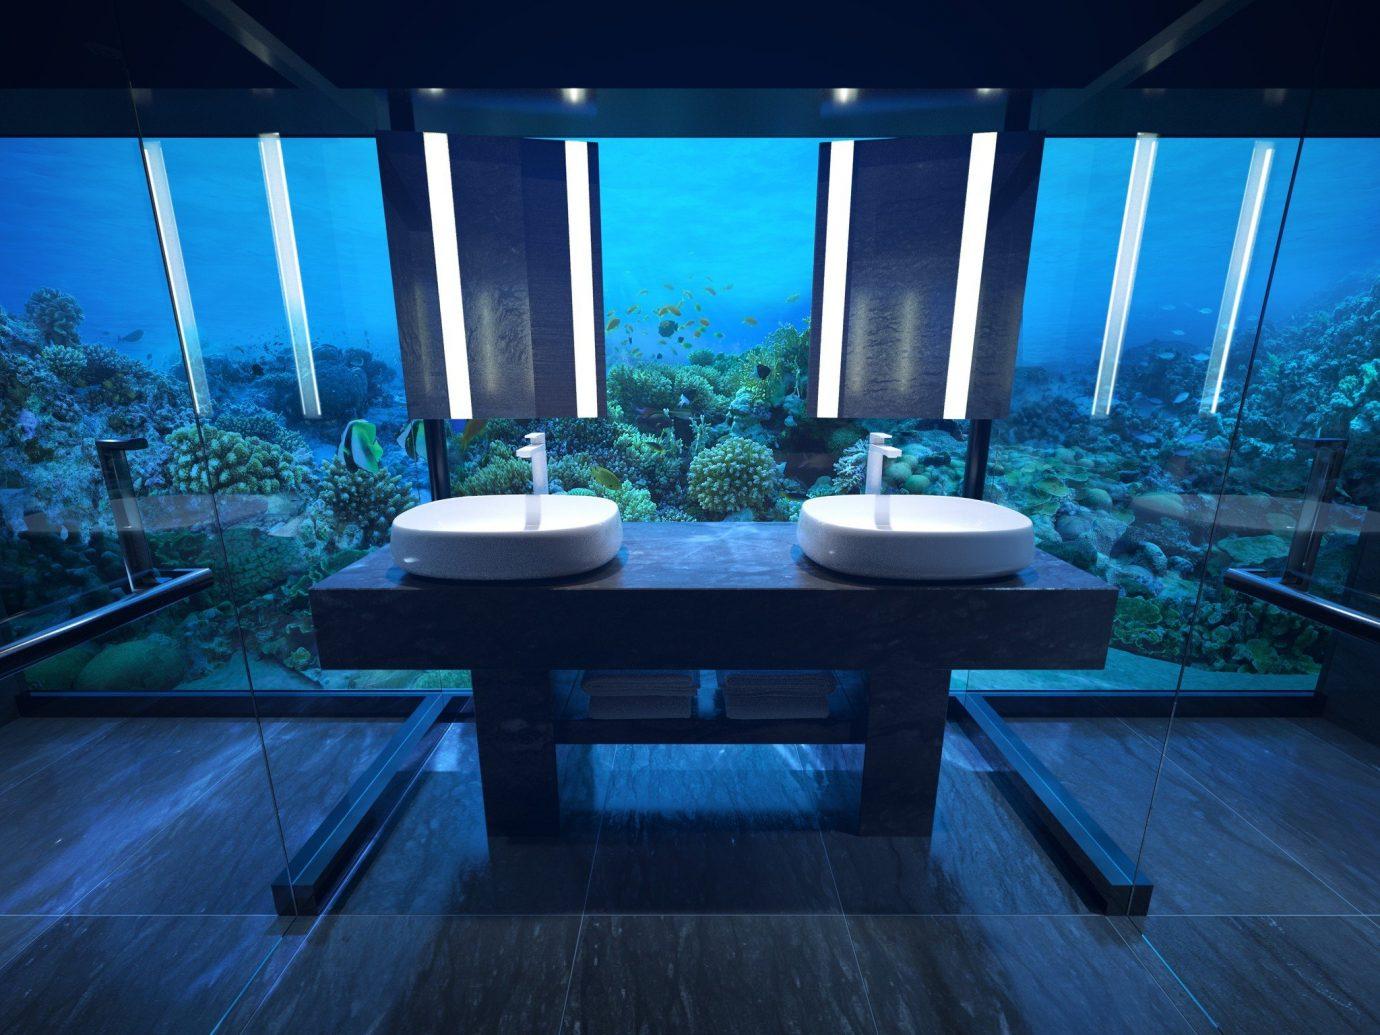 asia Beach Hotels Islands Maldives News Architecture lighting water interior design computer wallpaper swimming pool